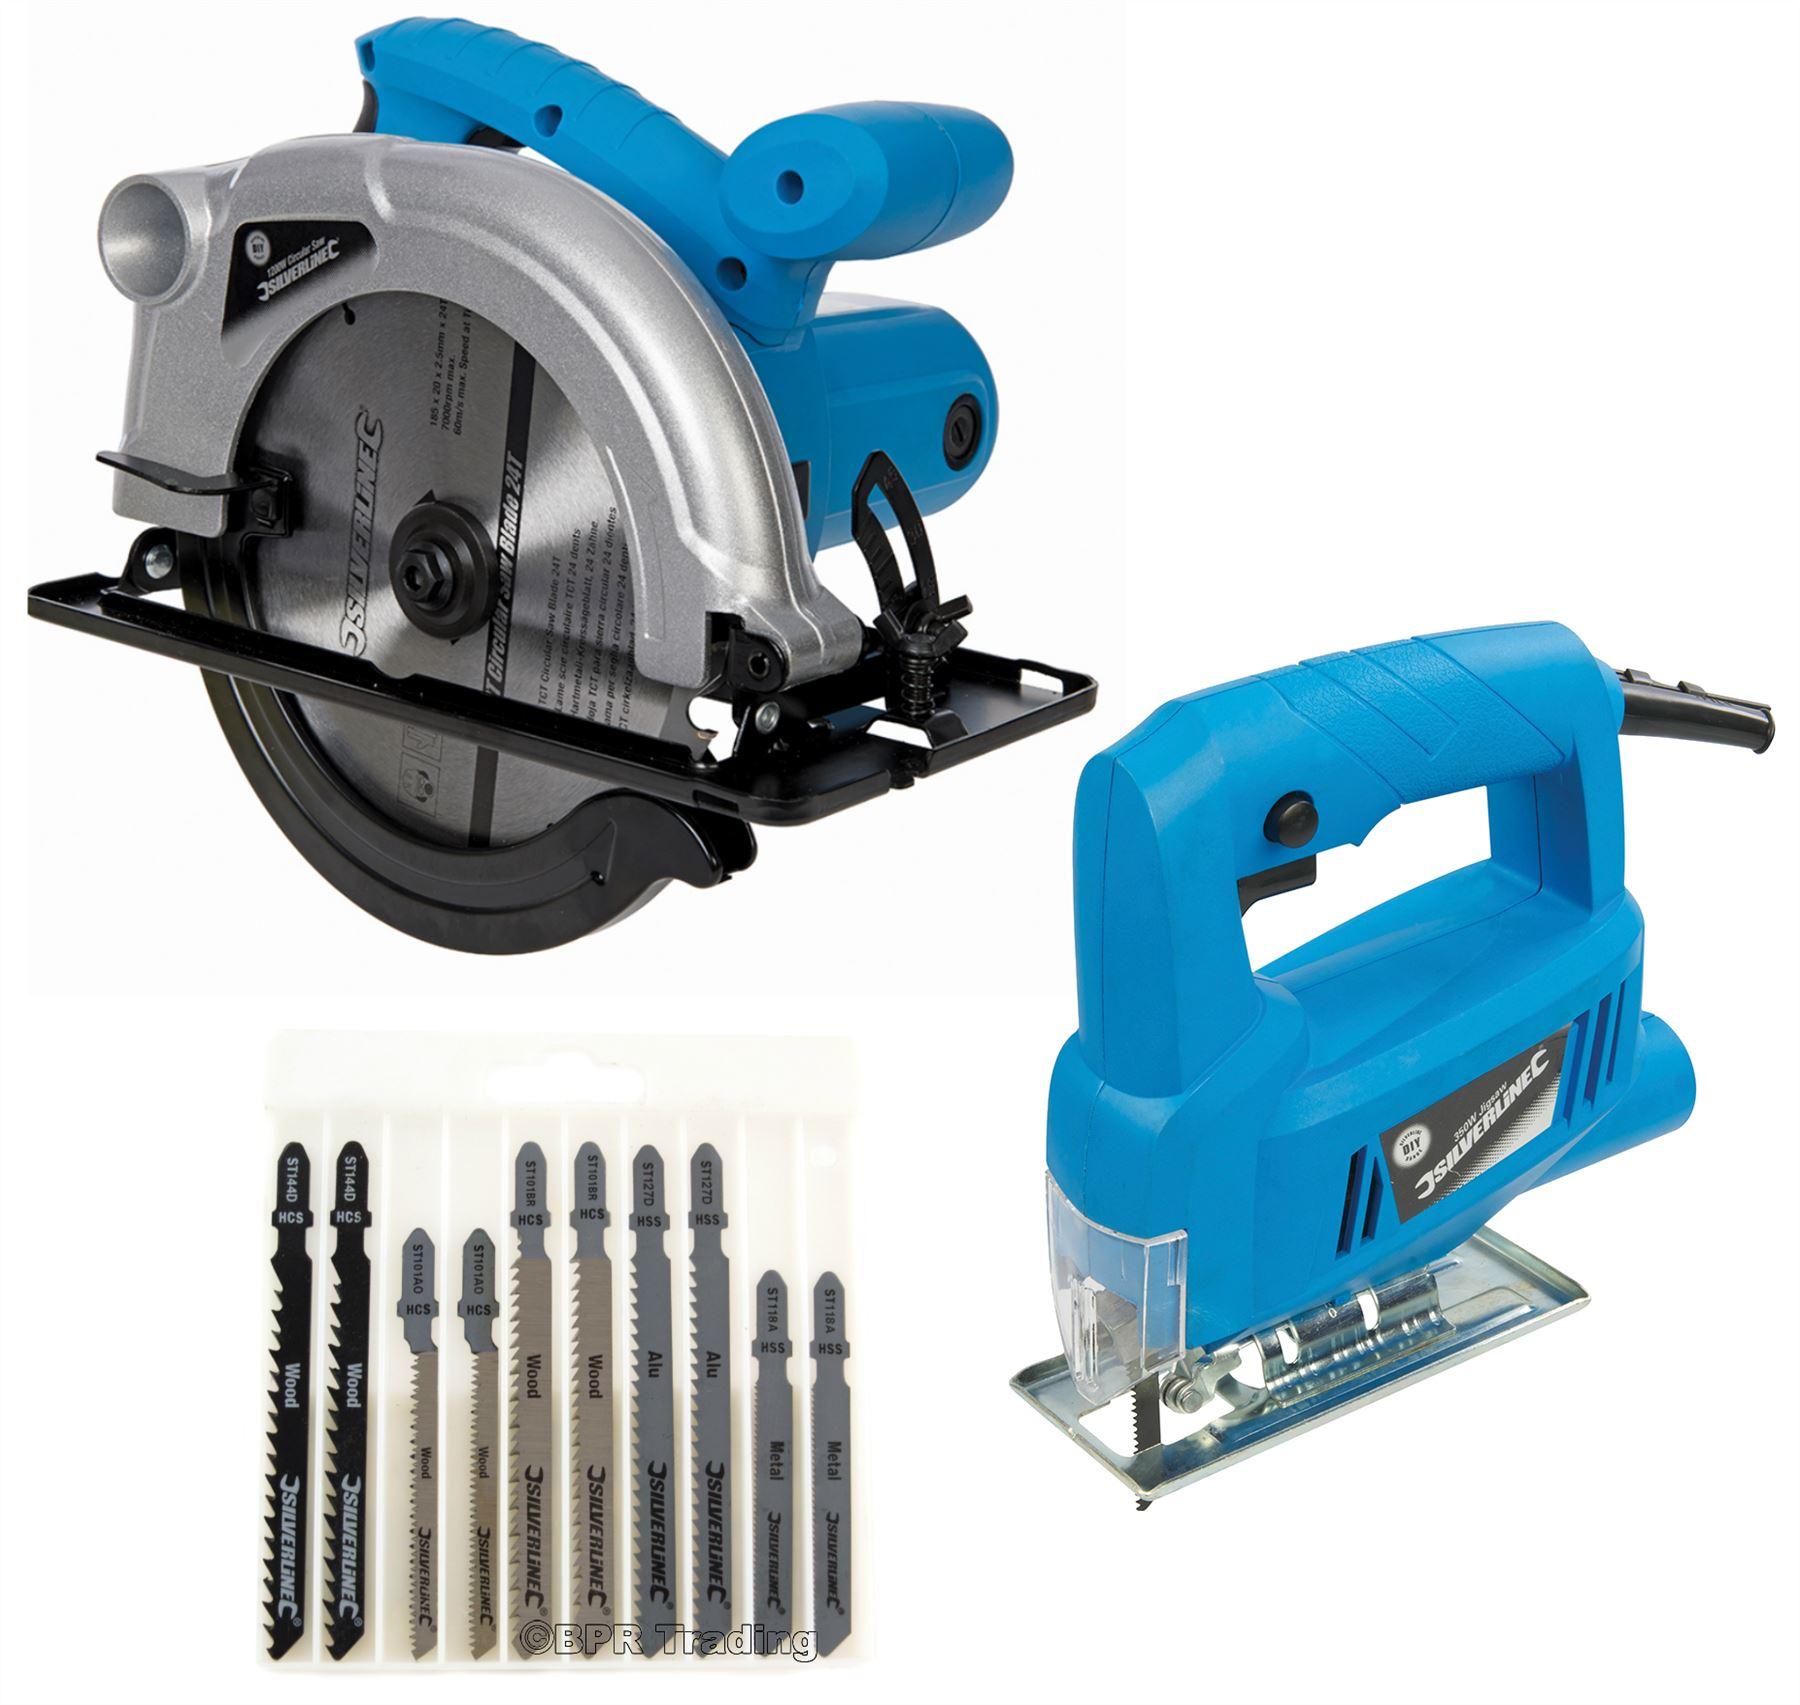 how to use skil circular saw